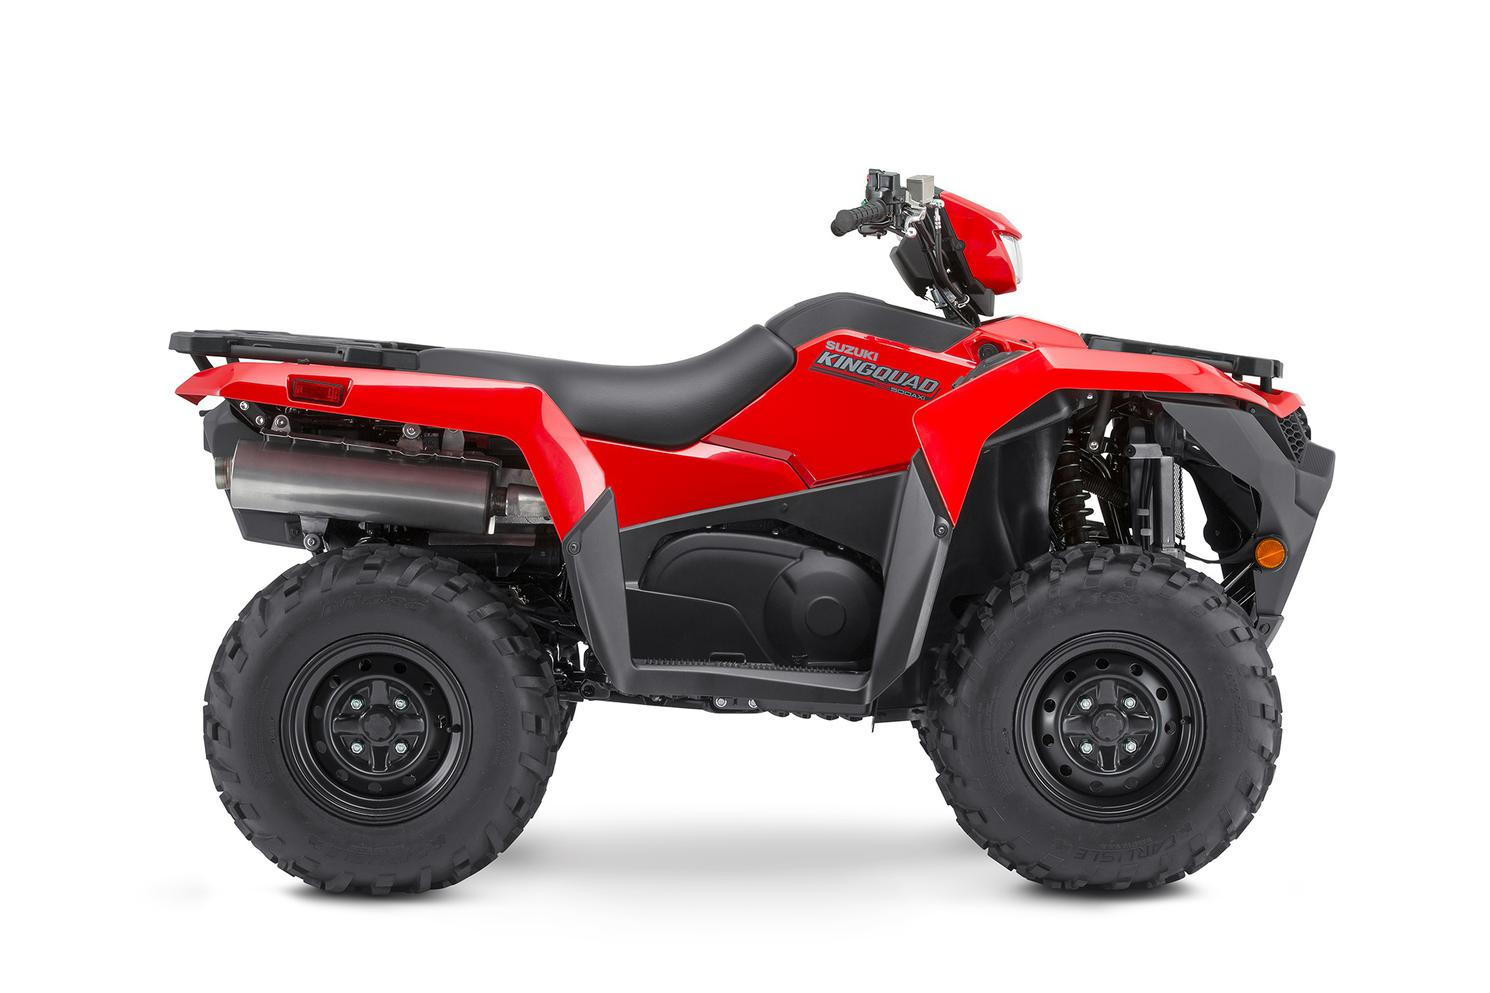 Suzuki KingQuad 500XP Rouge Flamme 2022